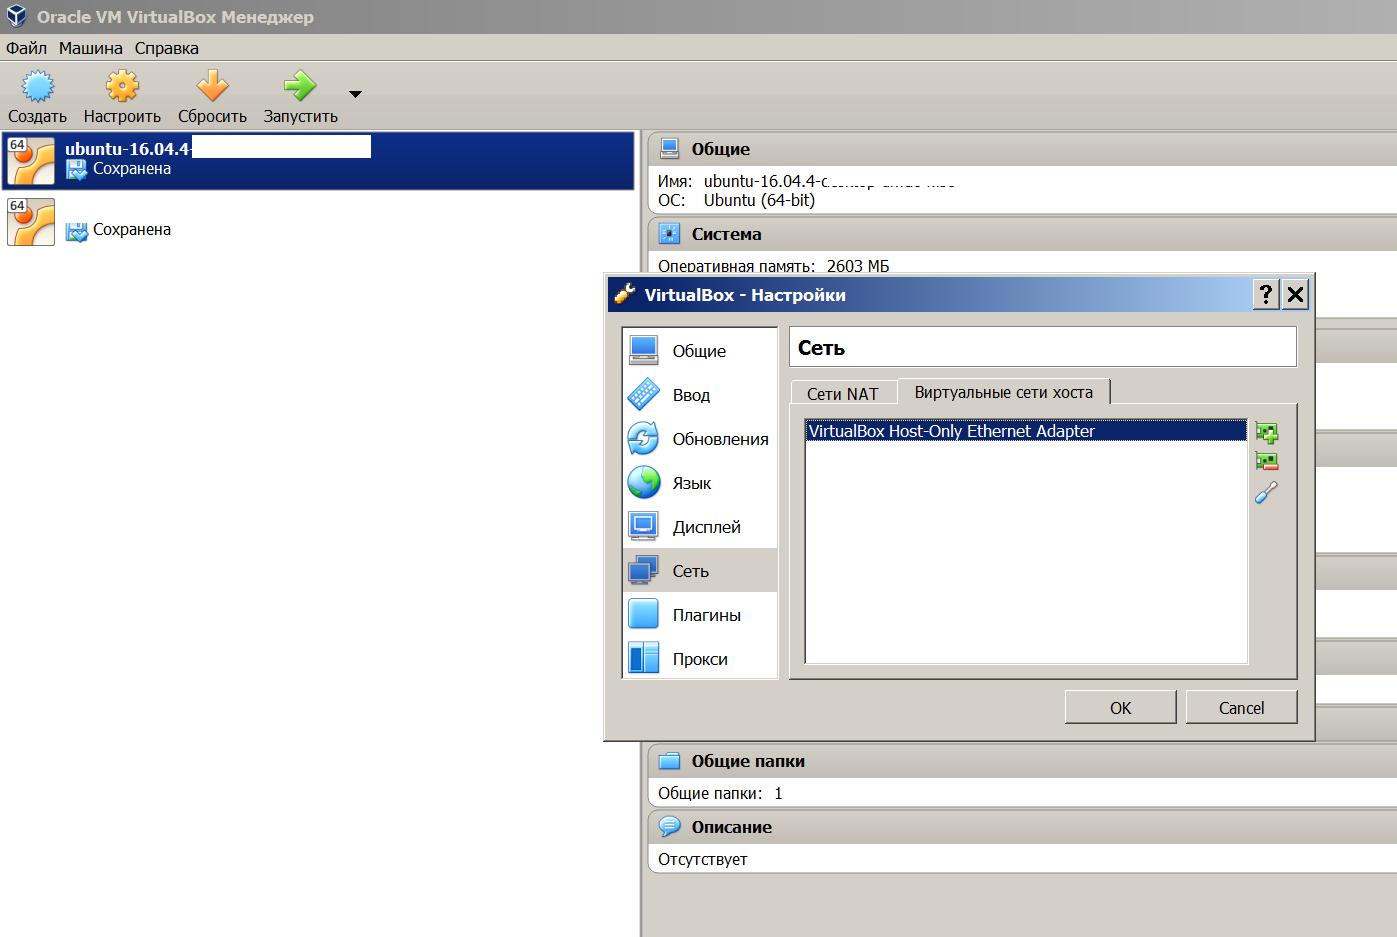 сеть вида VirtualBox Host-Only Ethernet Adapter